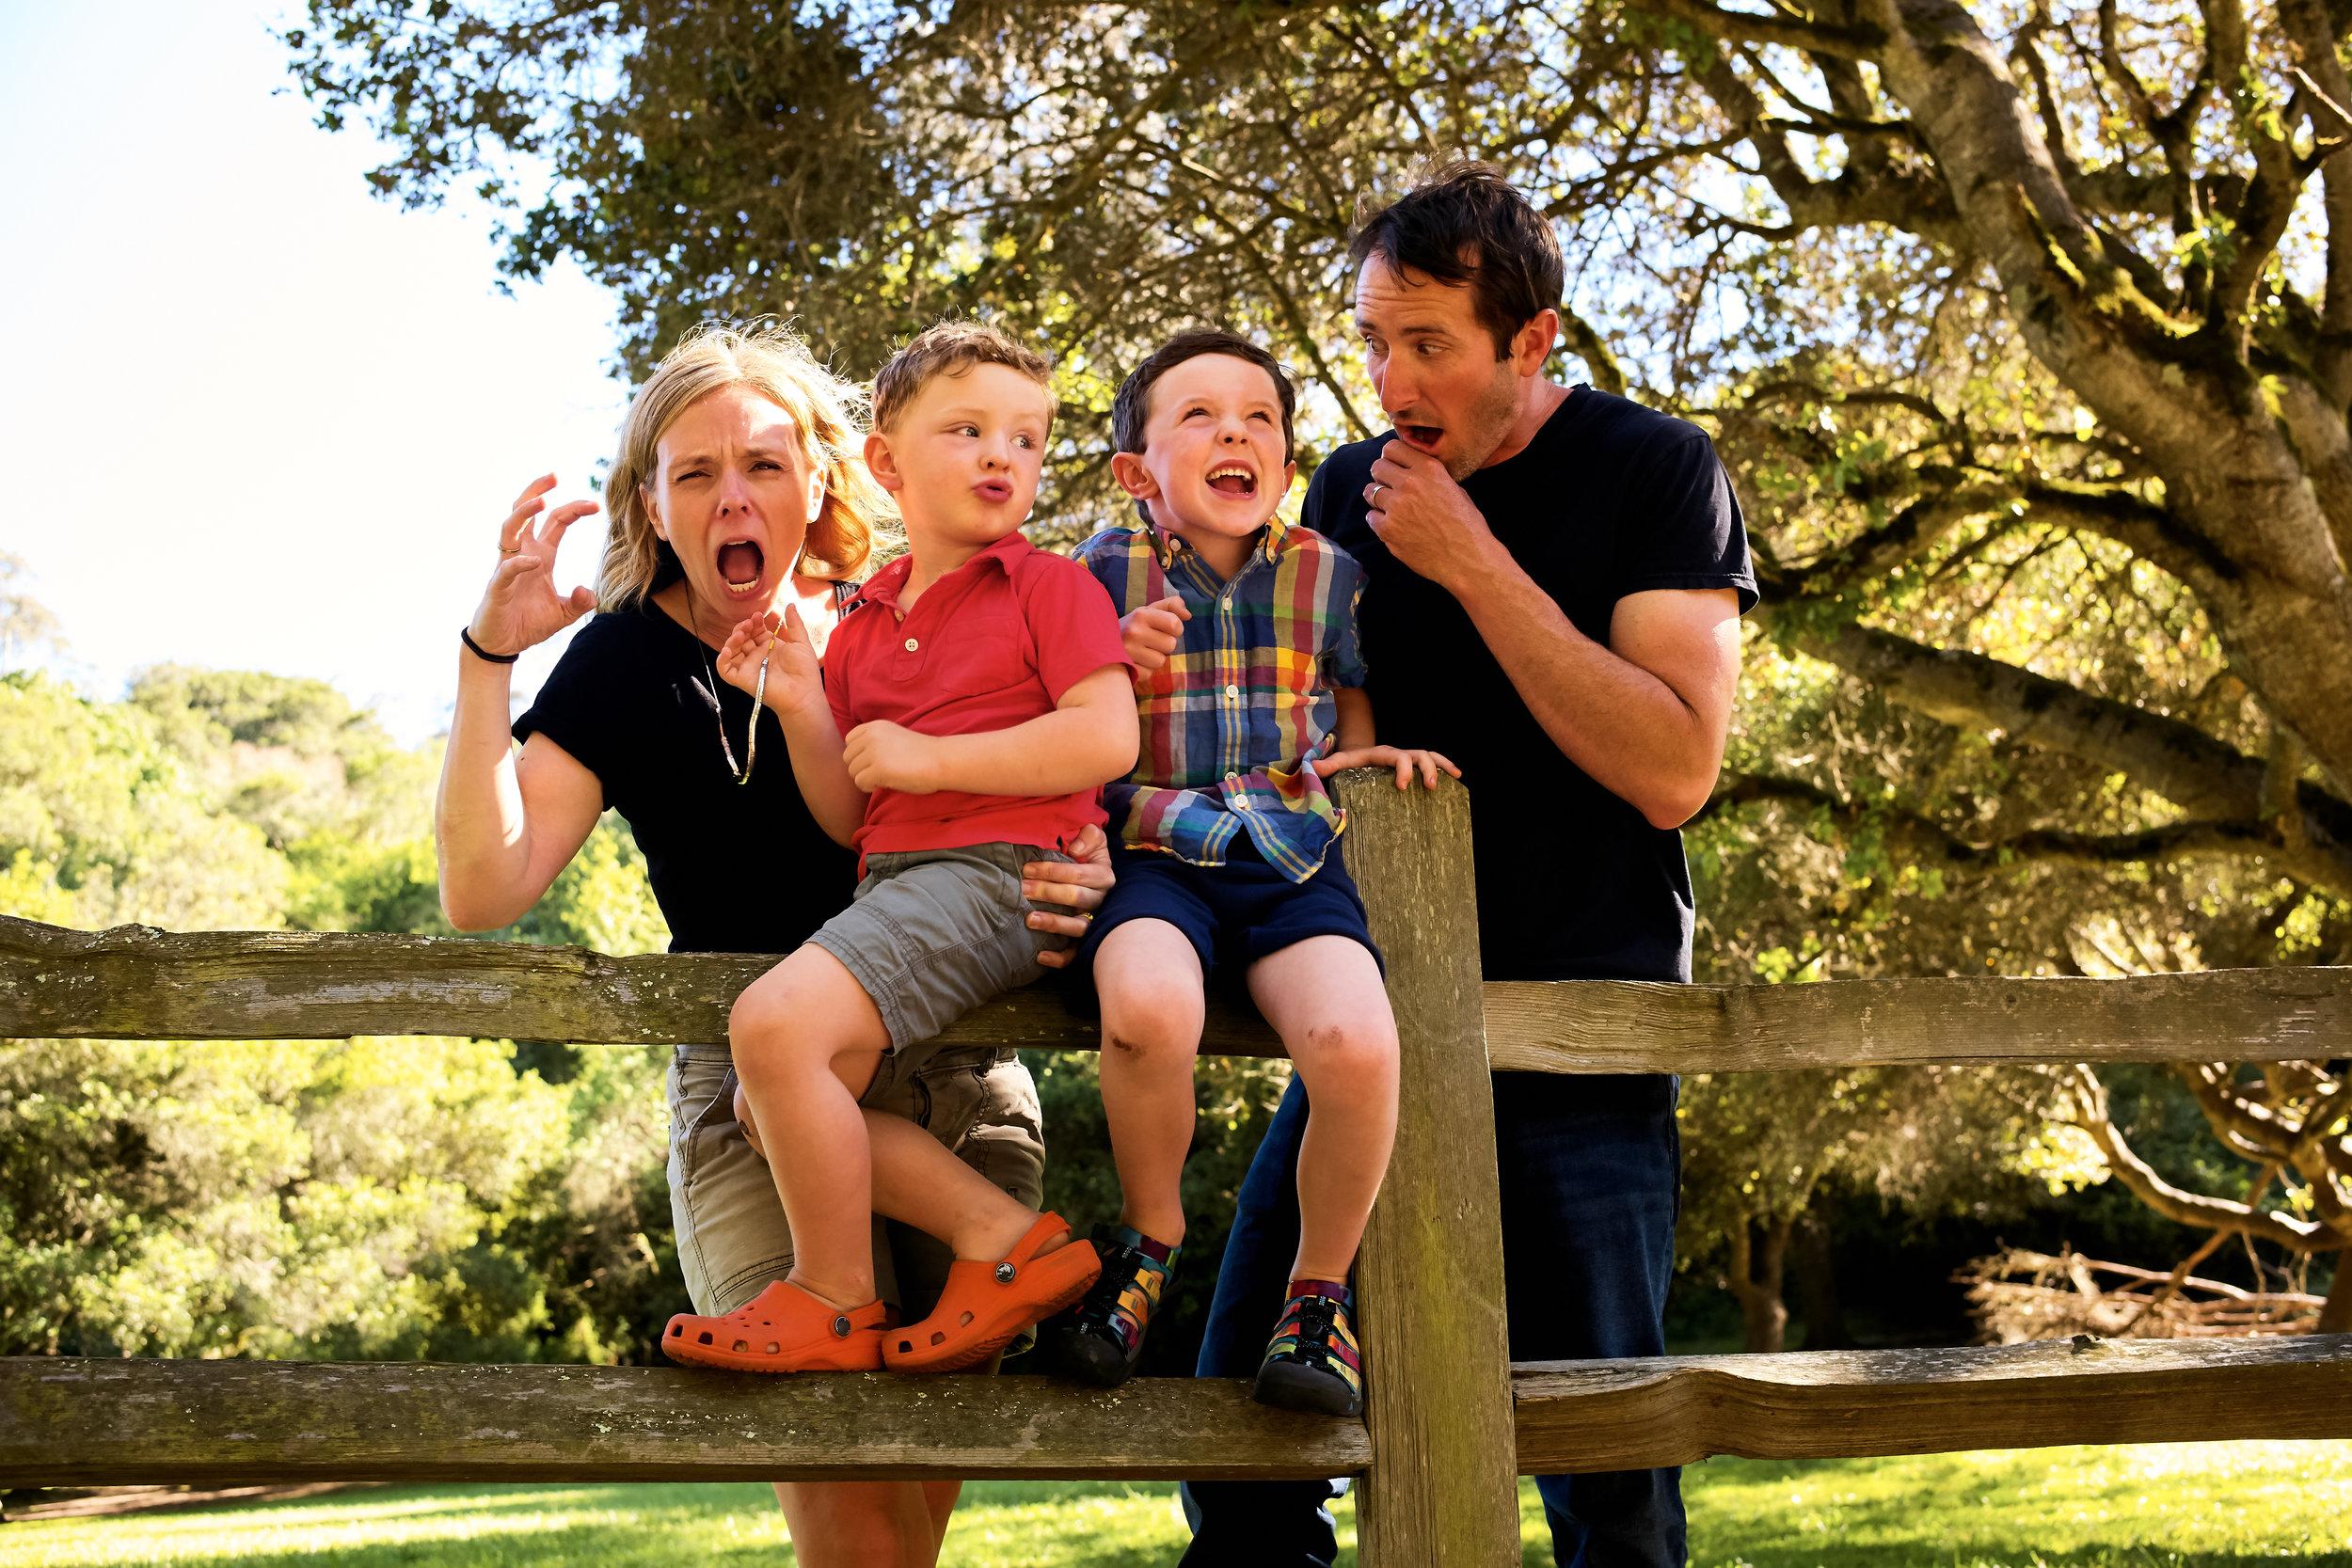 Family_13e_BrookeGregNTheirAwesomeBoys.jpg